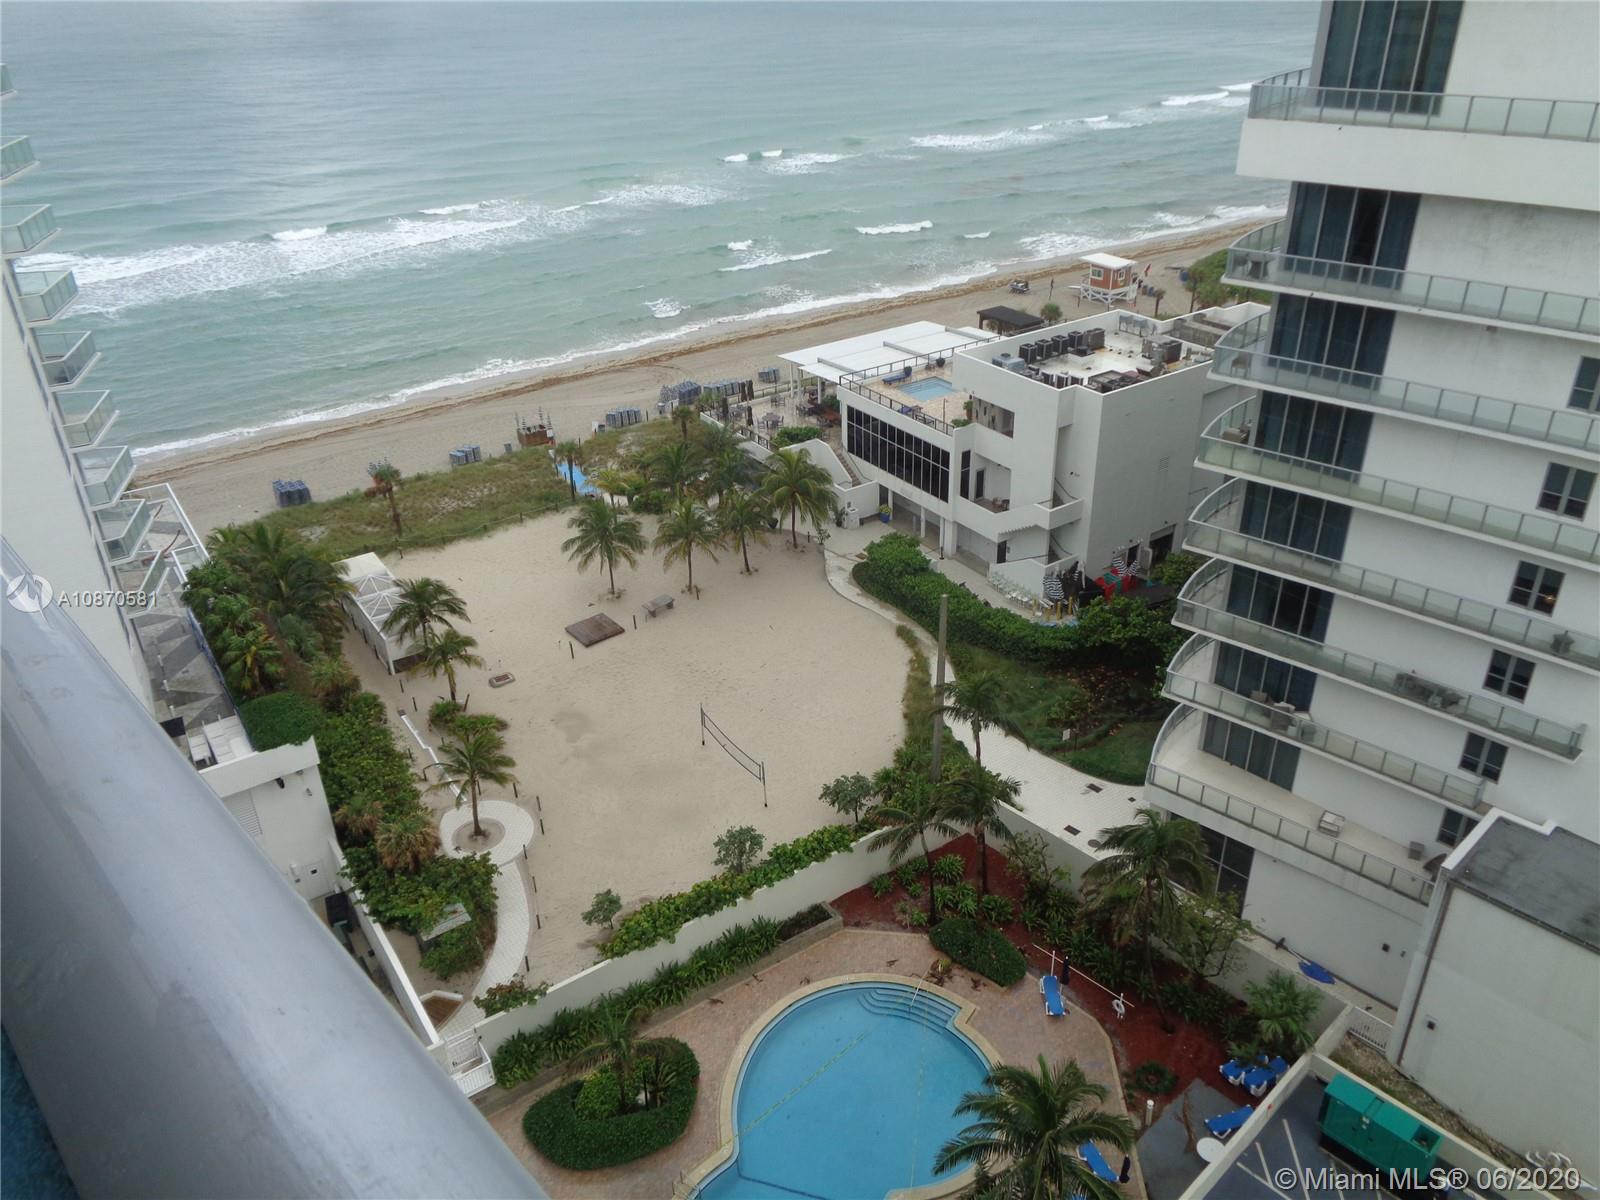 Sian Ocean Residences #16L - 4001 S Ocean Dr #16L, Hollywood, FL 33019